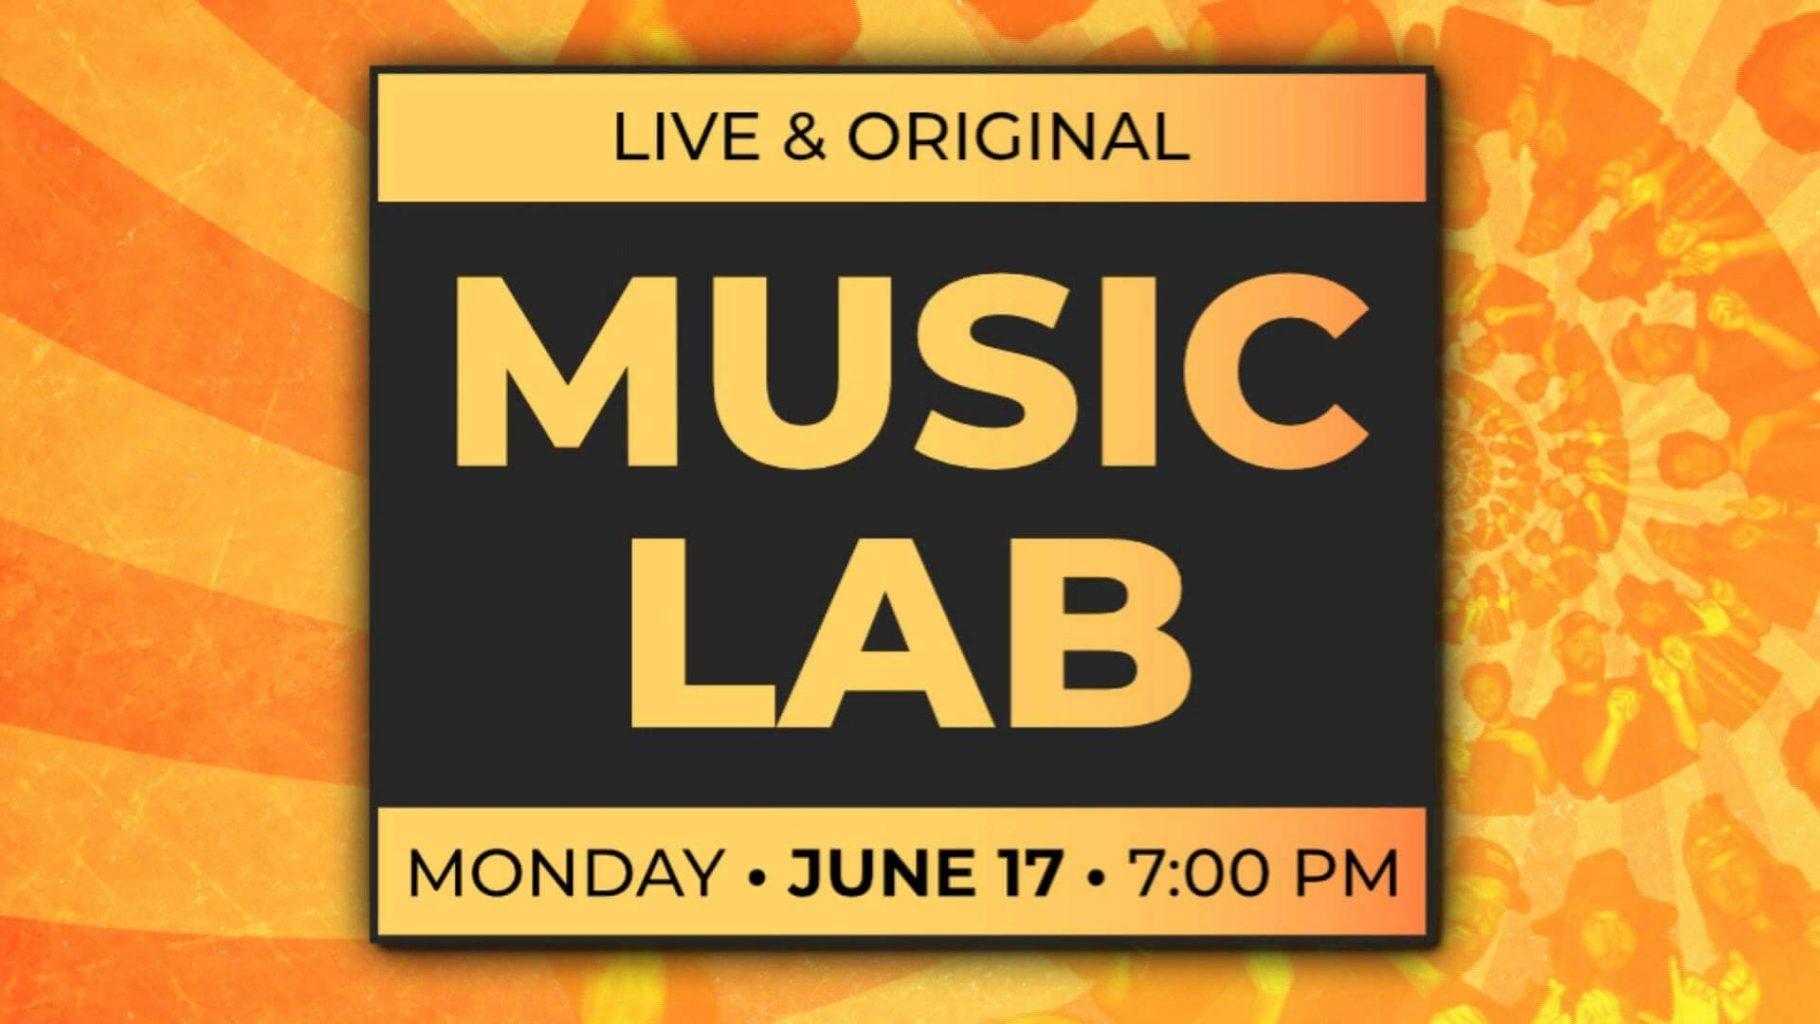 music lab monday june 17